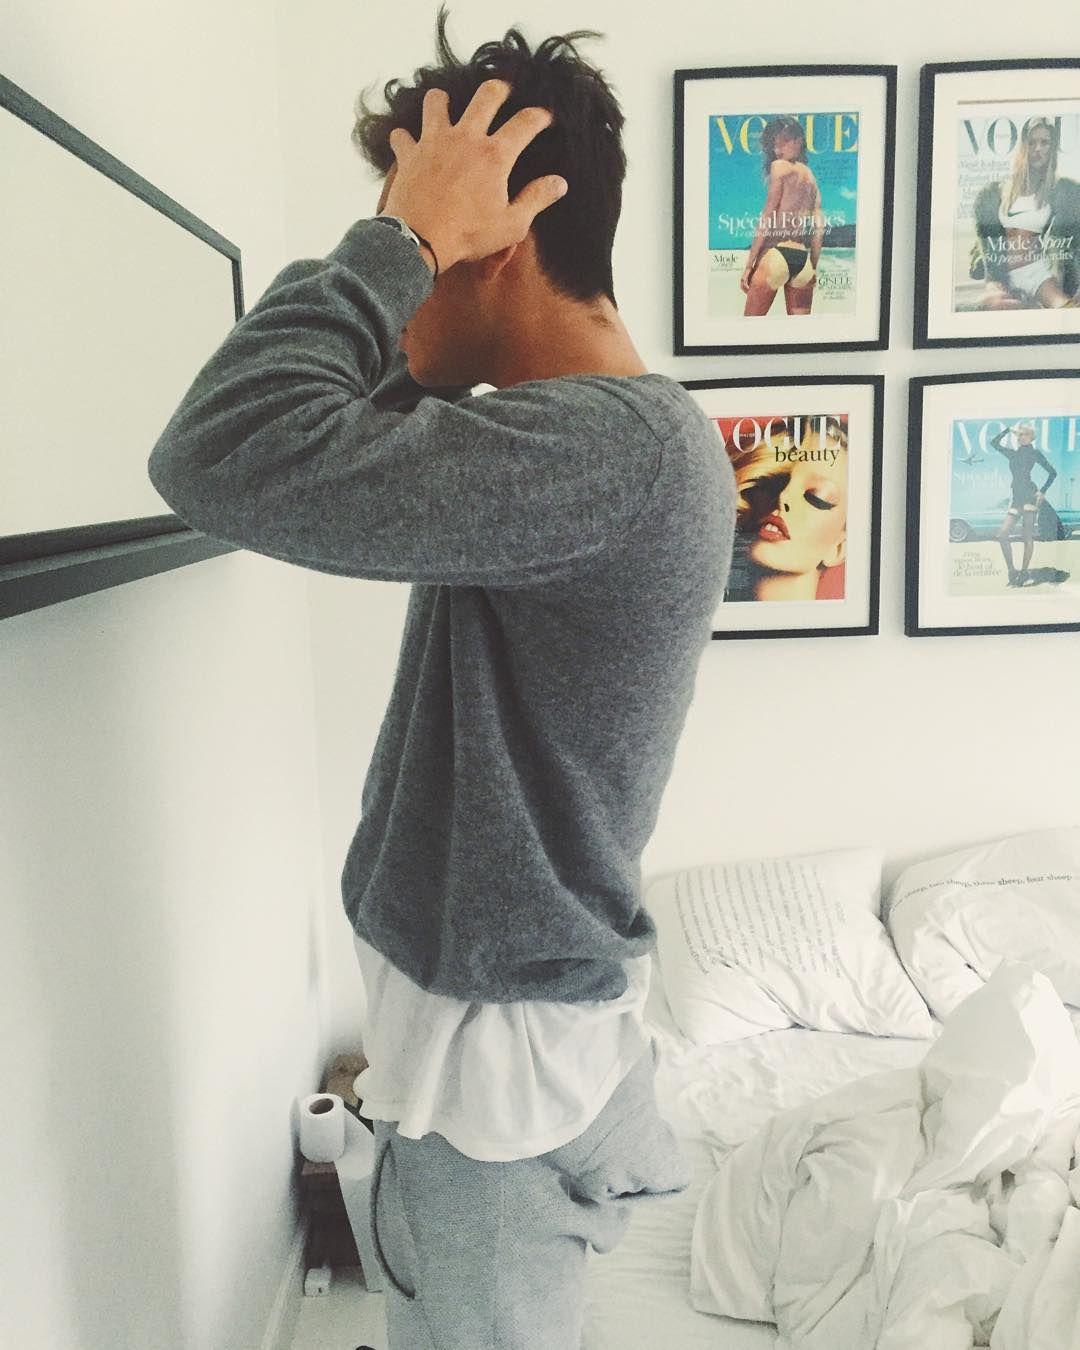 """Godmorgen skat  #morgenhår#sunday#morning#snooze#greyshades#sleepysleepy"""